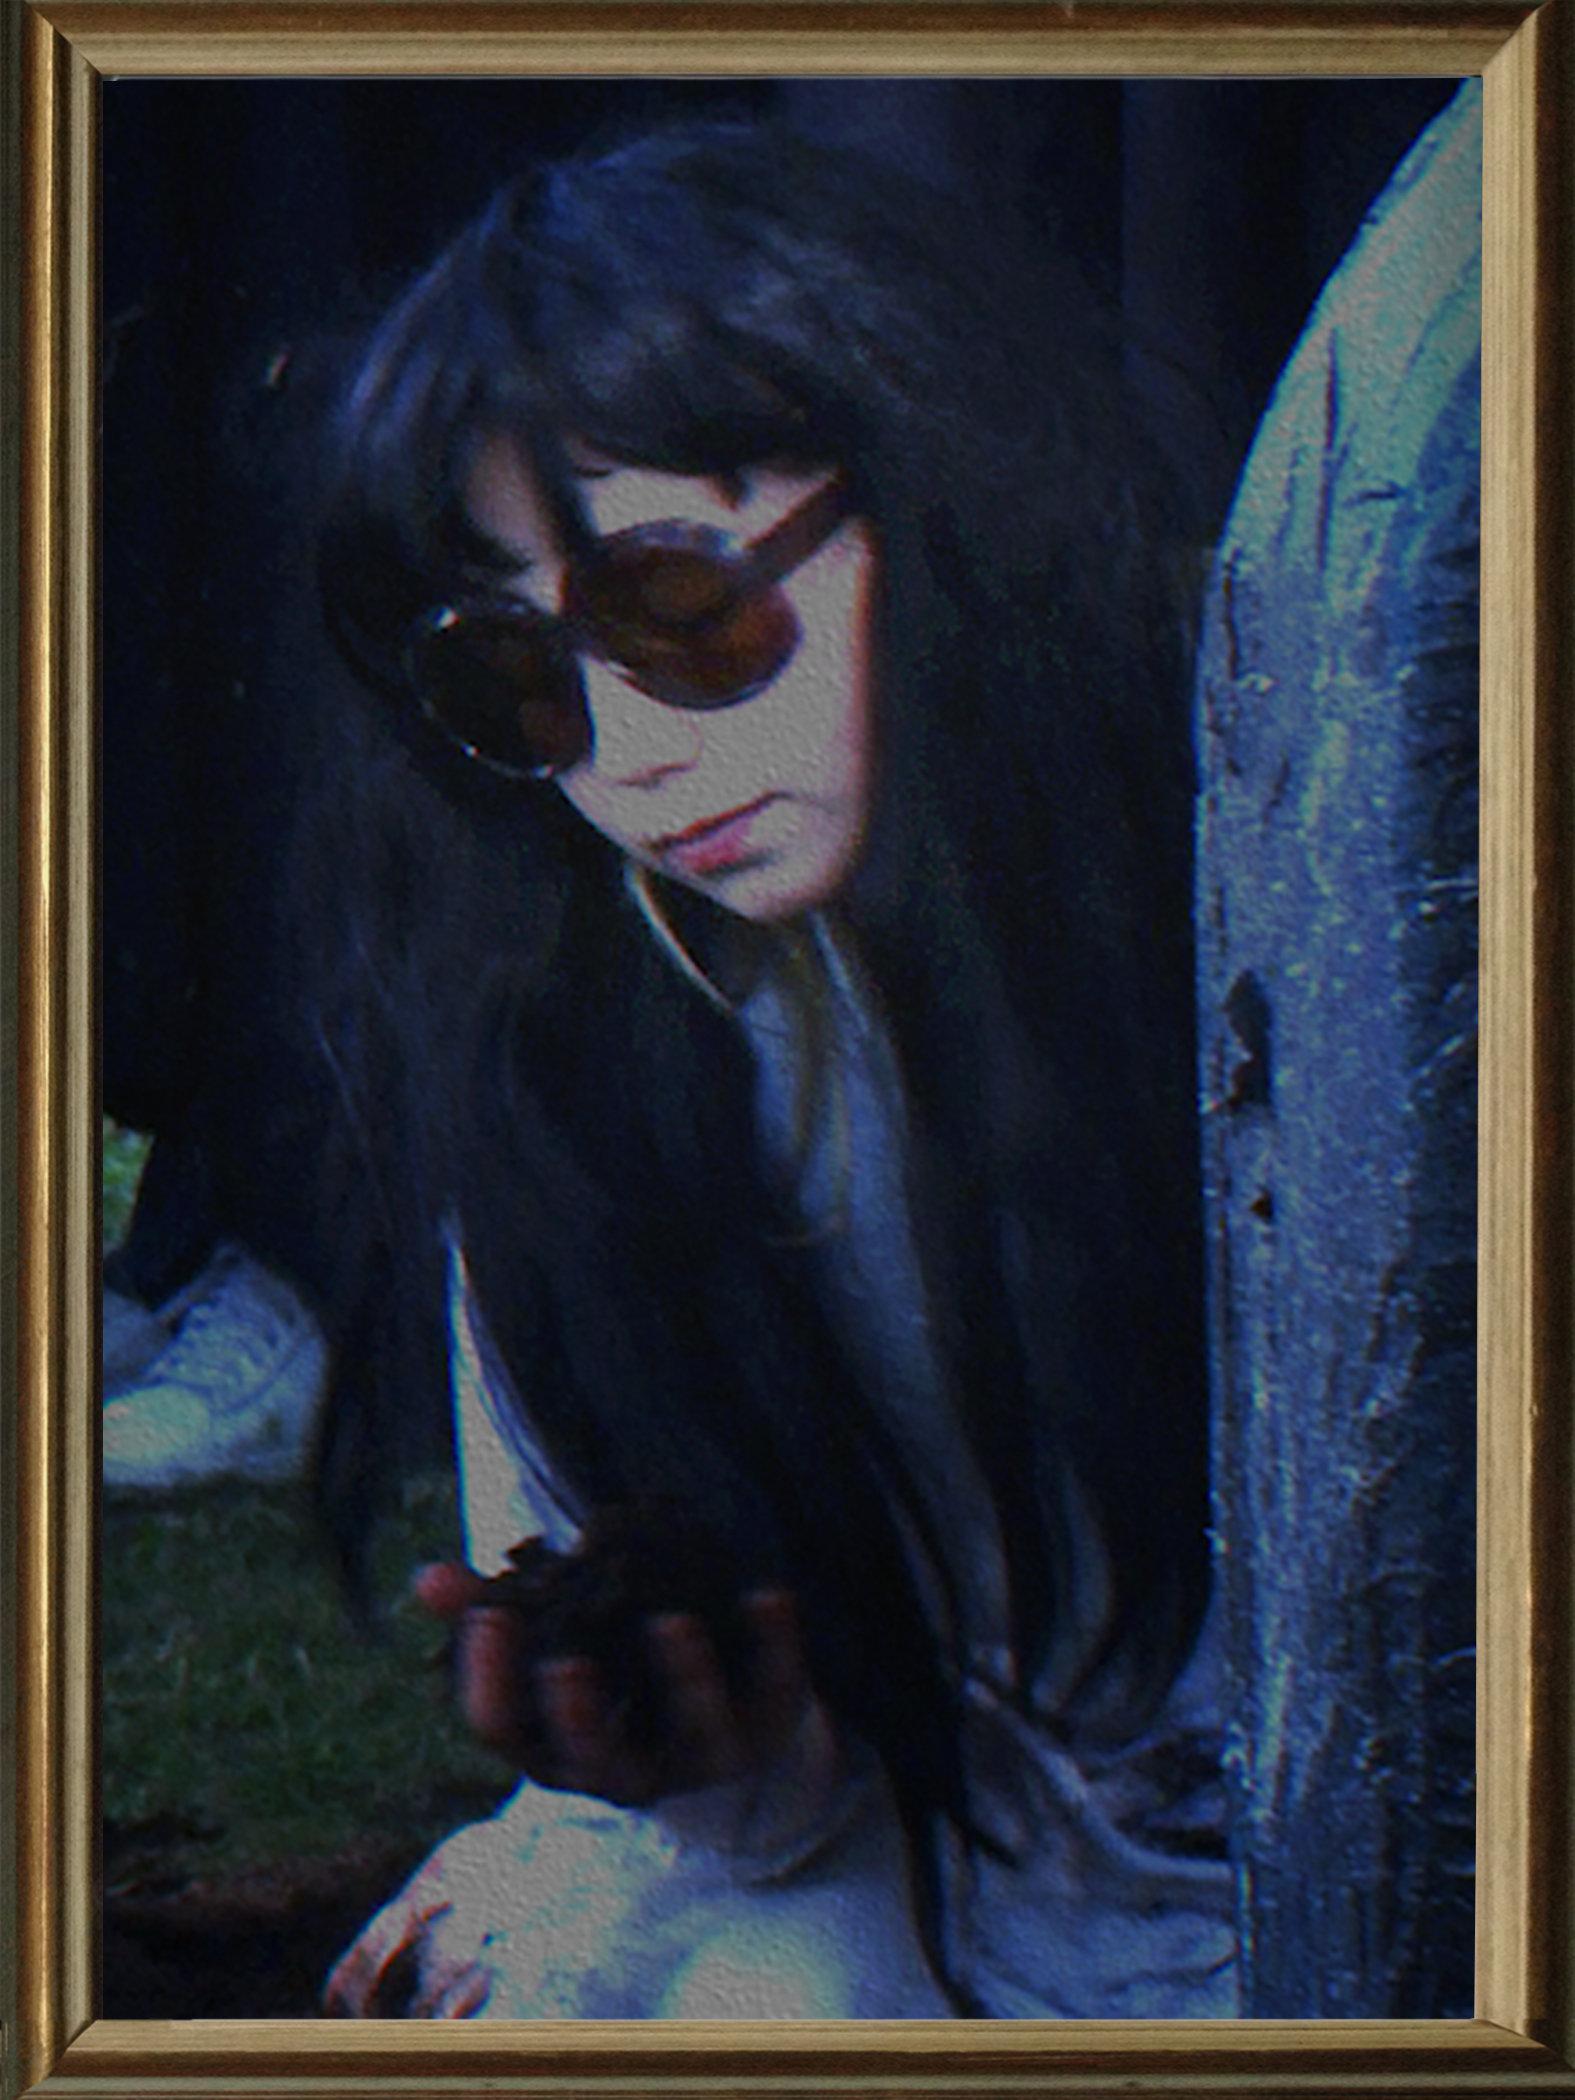 BINETA HANSEN as Lena-Barbara & Mini-Yoko Ono